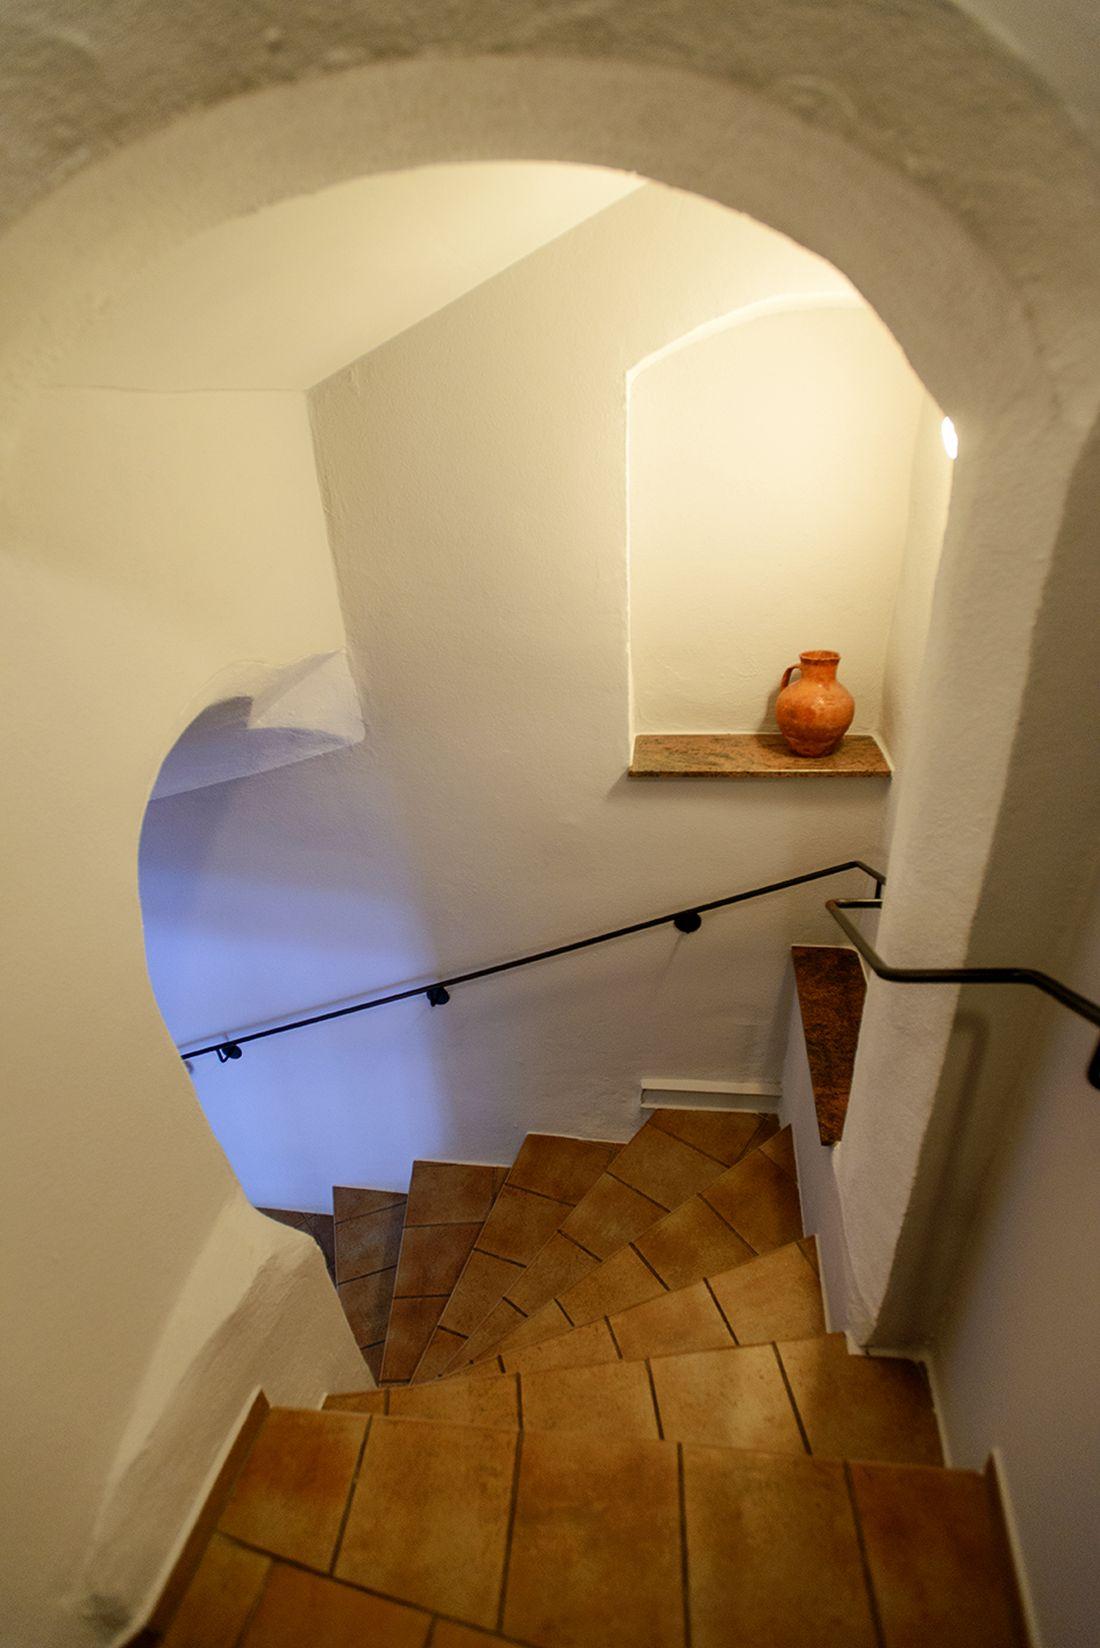 Doppelzimmer – Marktblick - bautzen-pension-zimmer-007-1.jpg